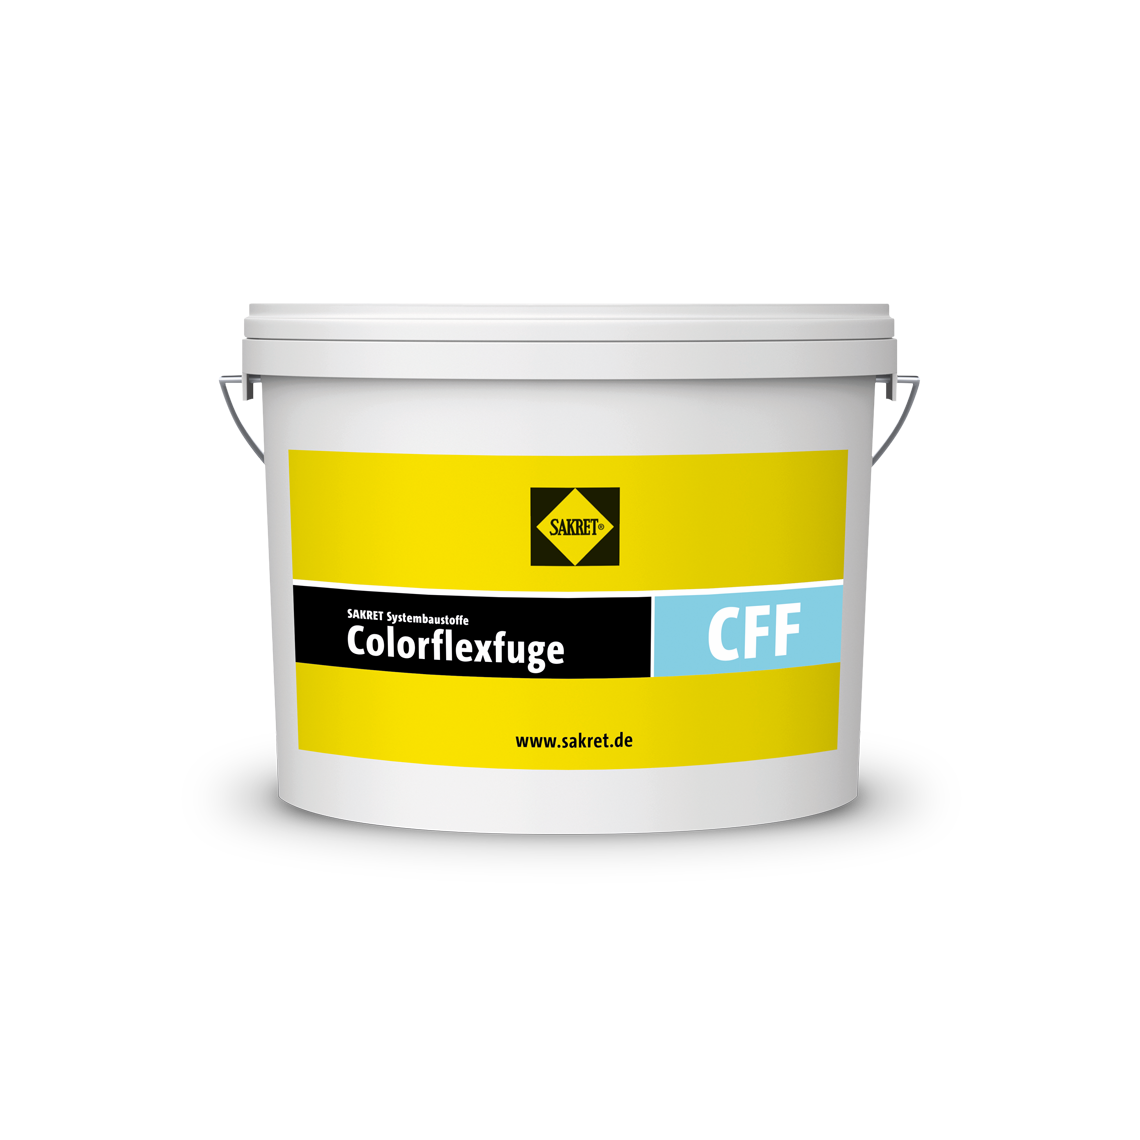 Abbildung SAKRET Colorflexfuge CFF